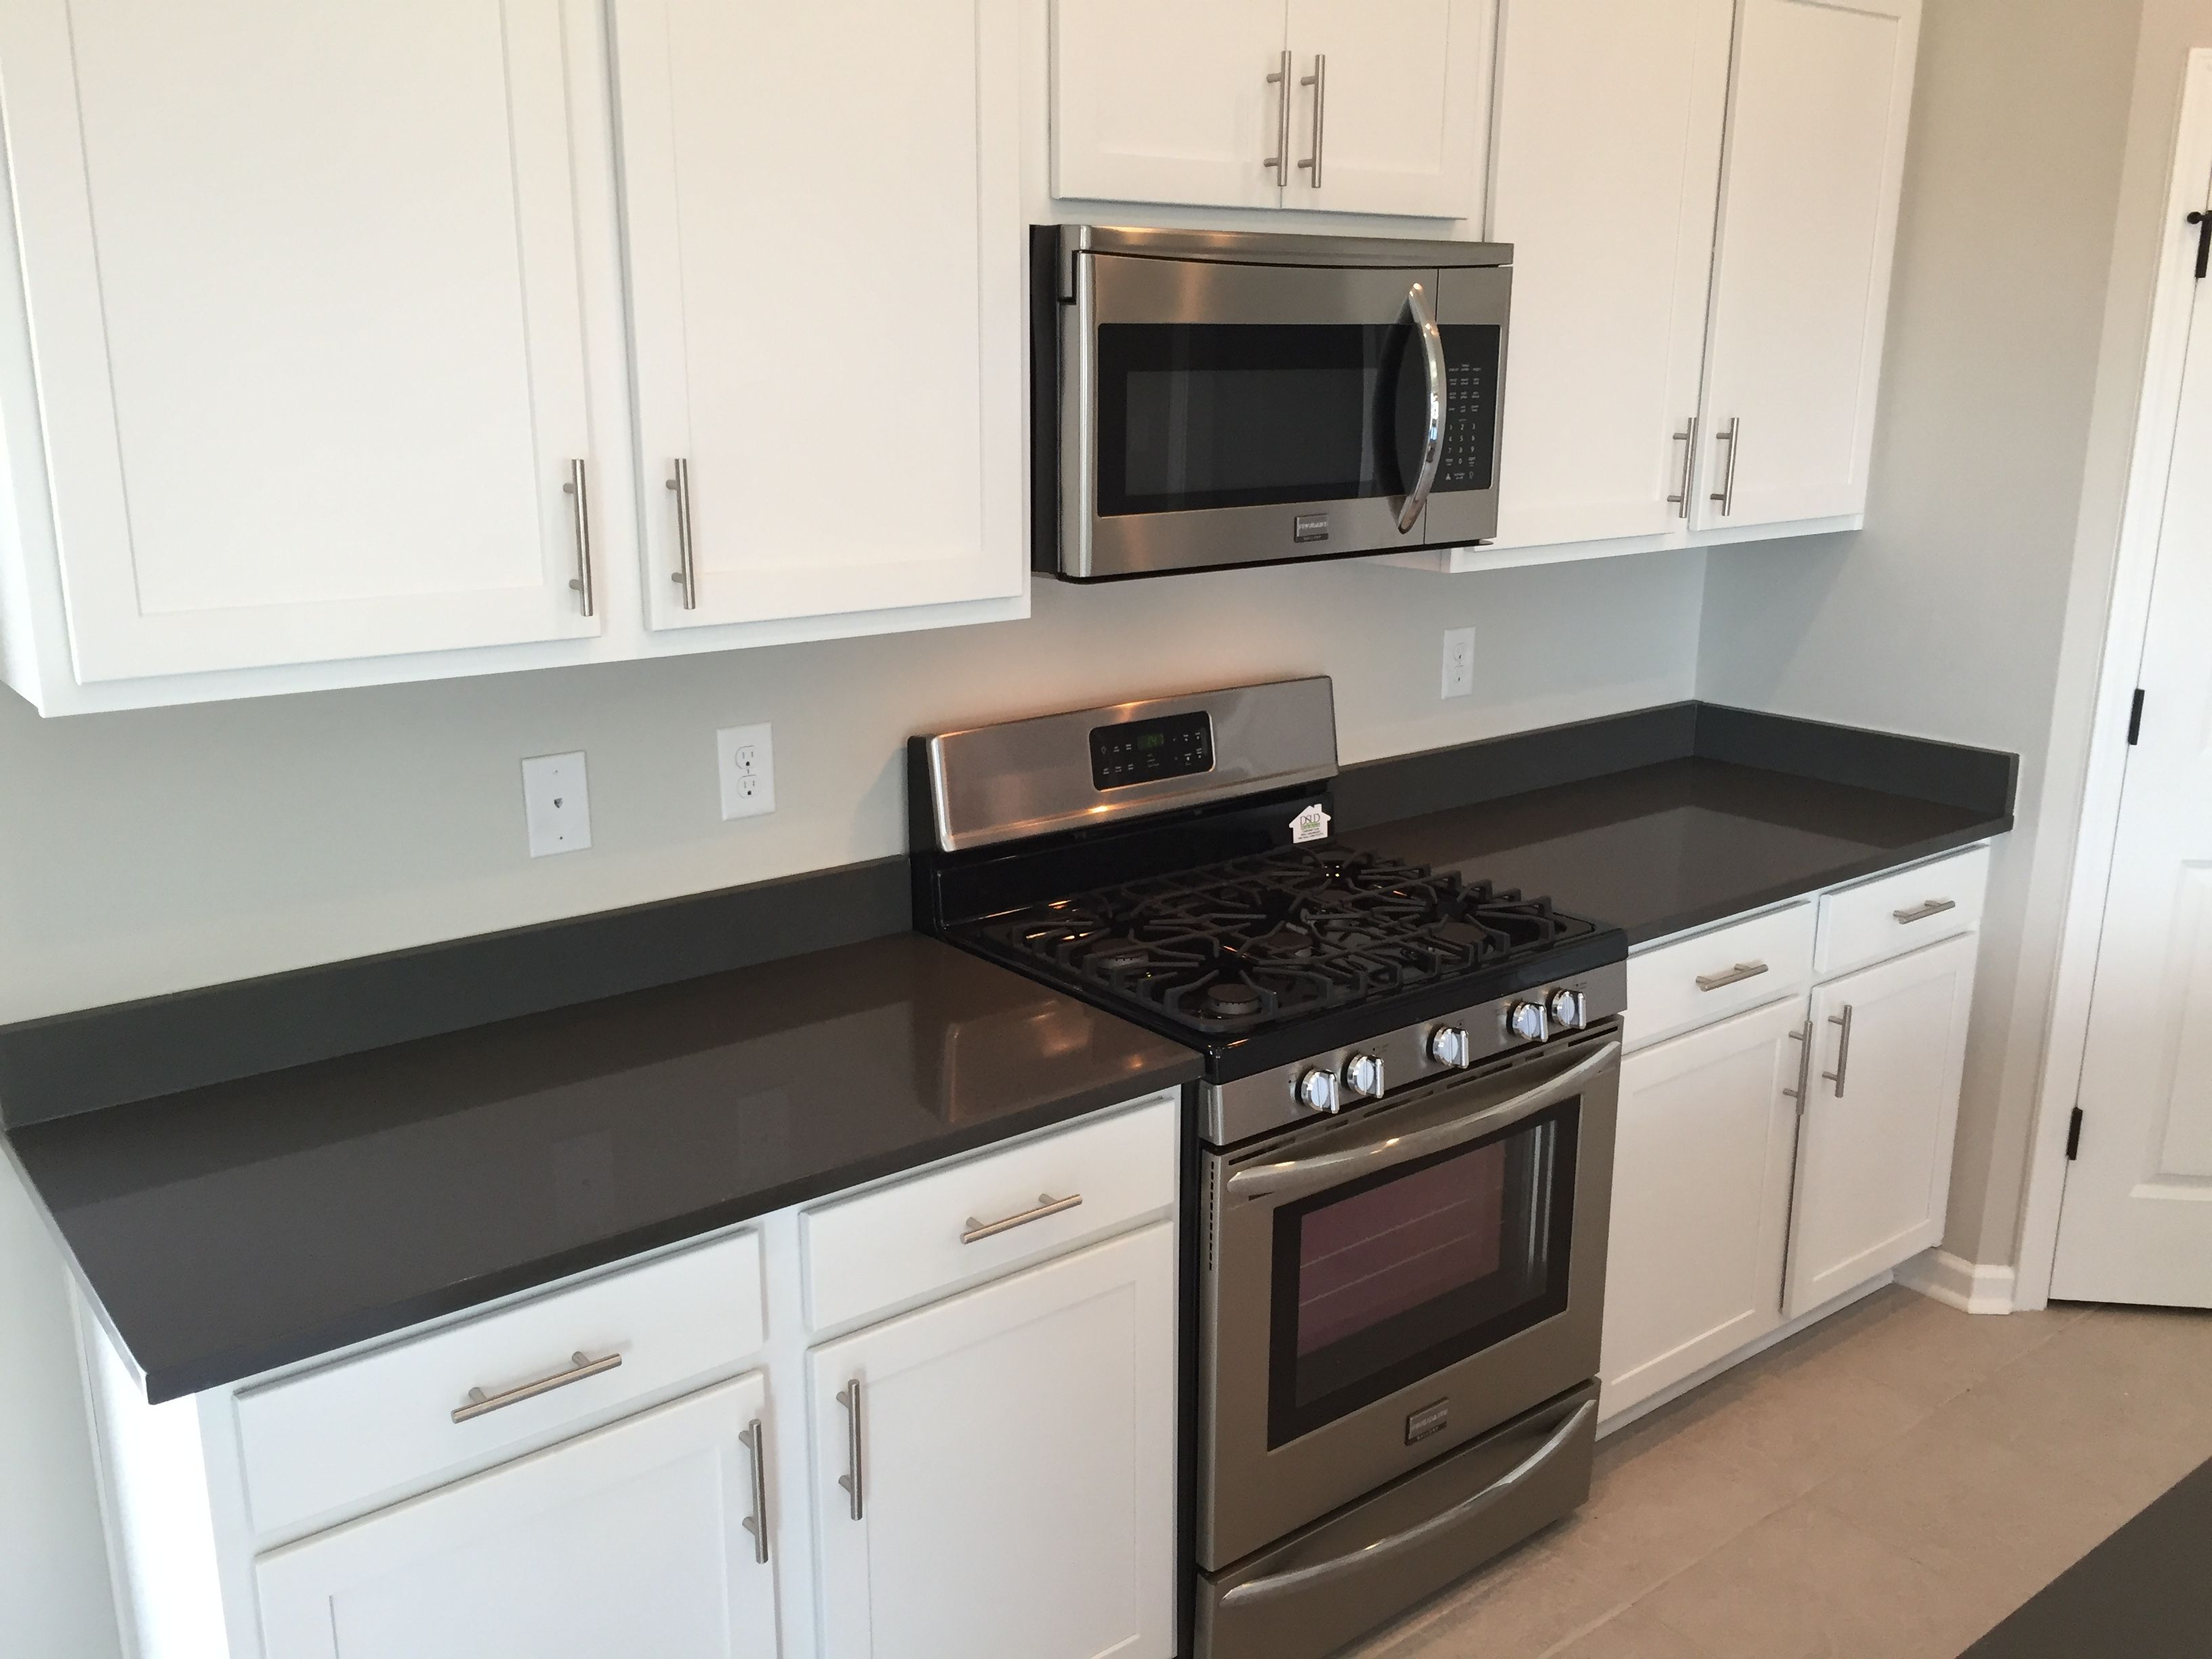 Oxford Kitchen White Cabinets Graphite Quartz Counters Sweet Home Kitchen Cabinet